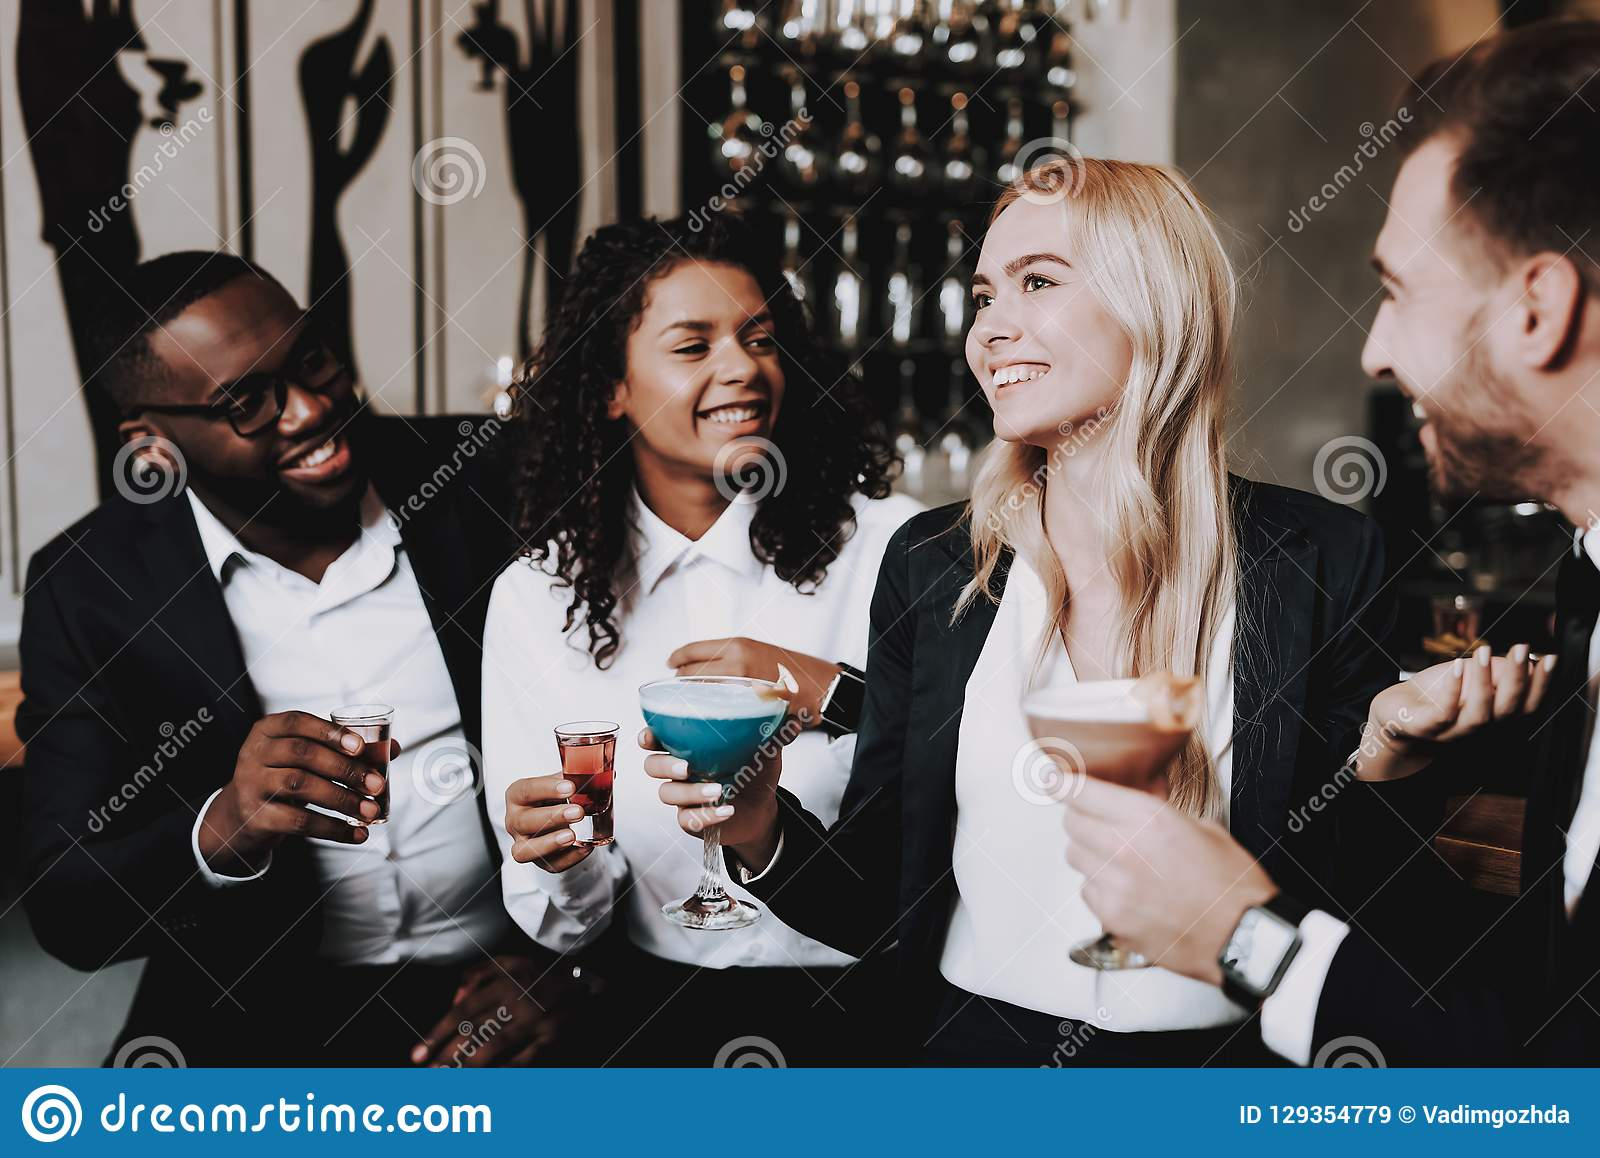 Chin-Chin Meninas e indivíduos Barra bebida clubbing